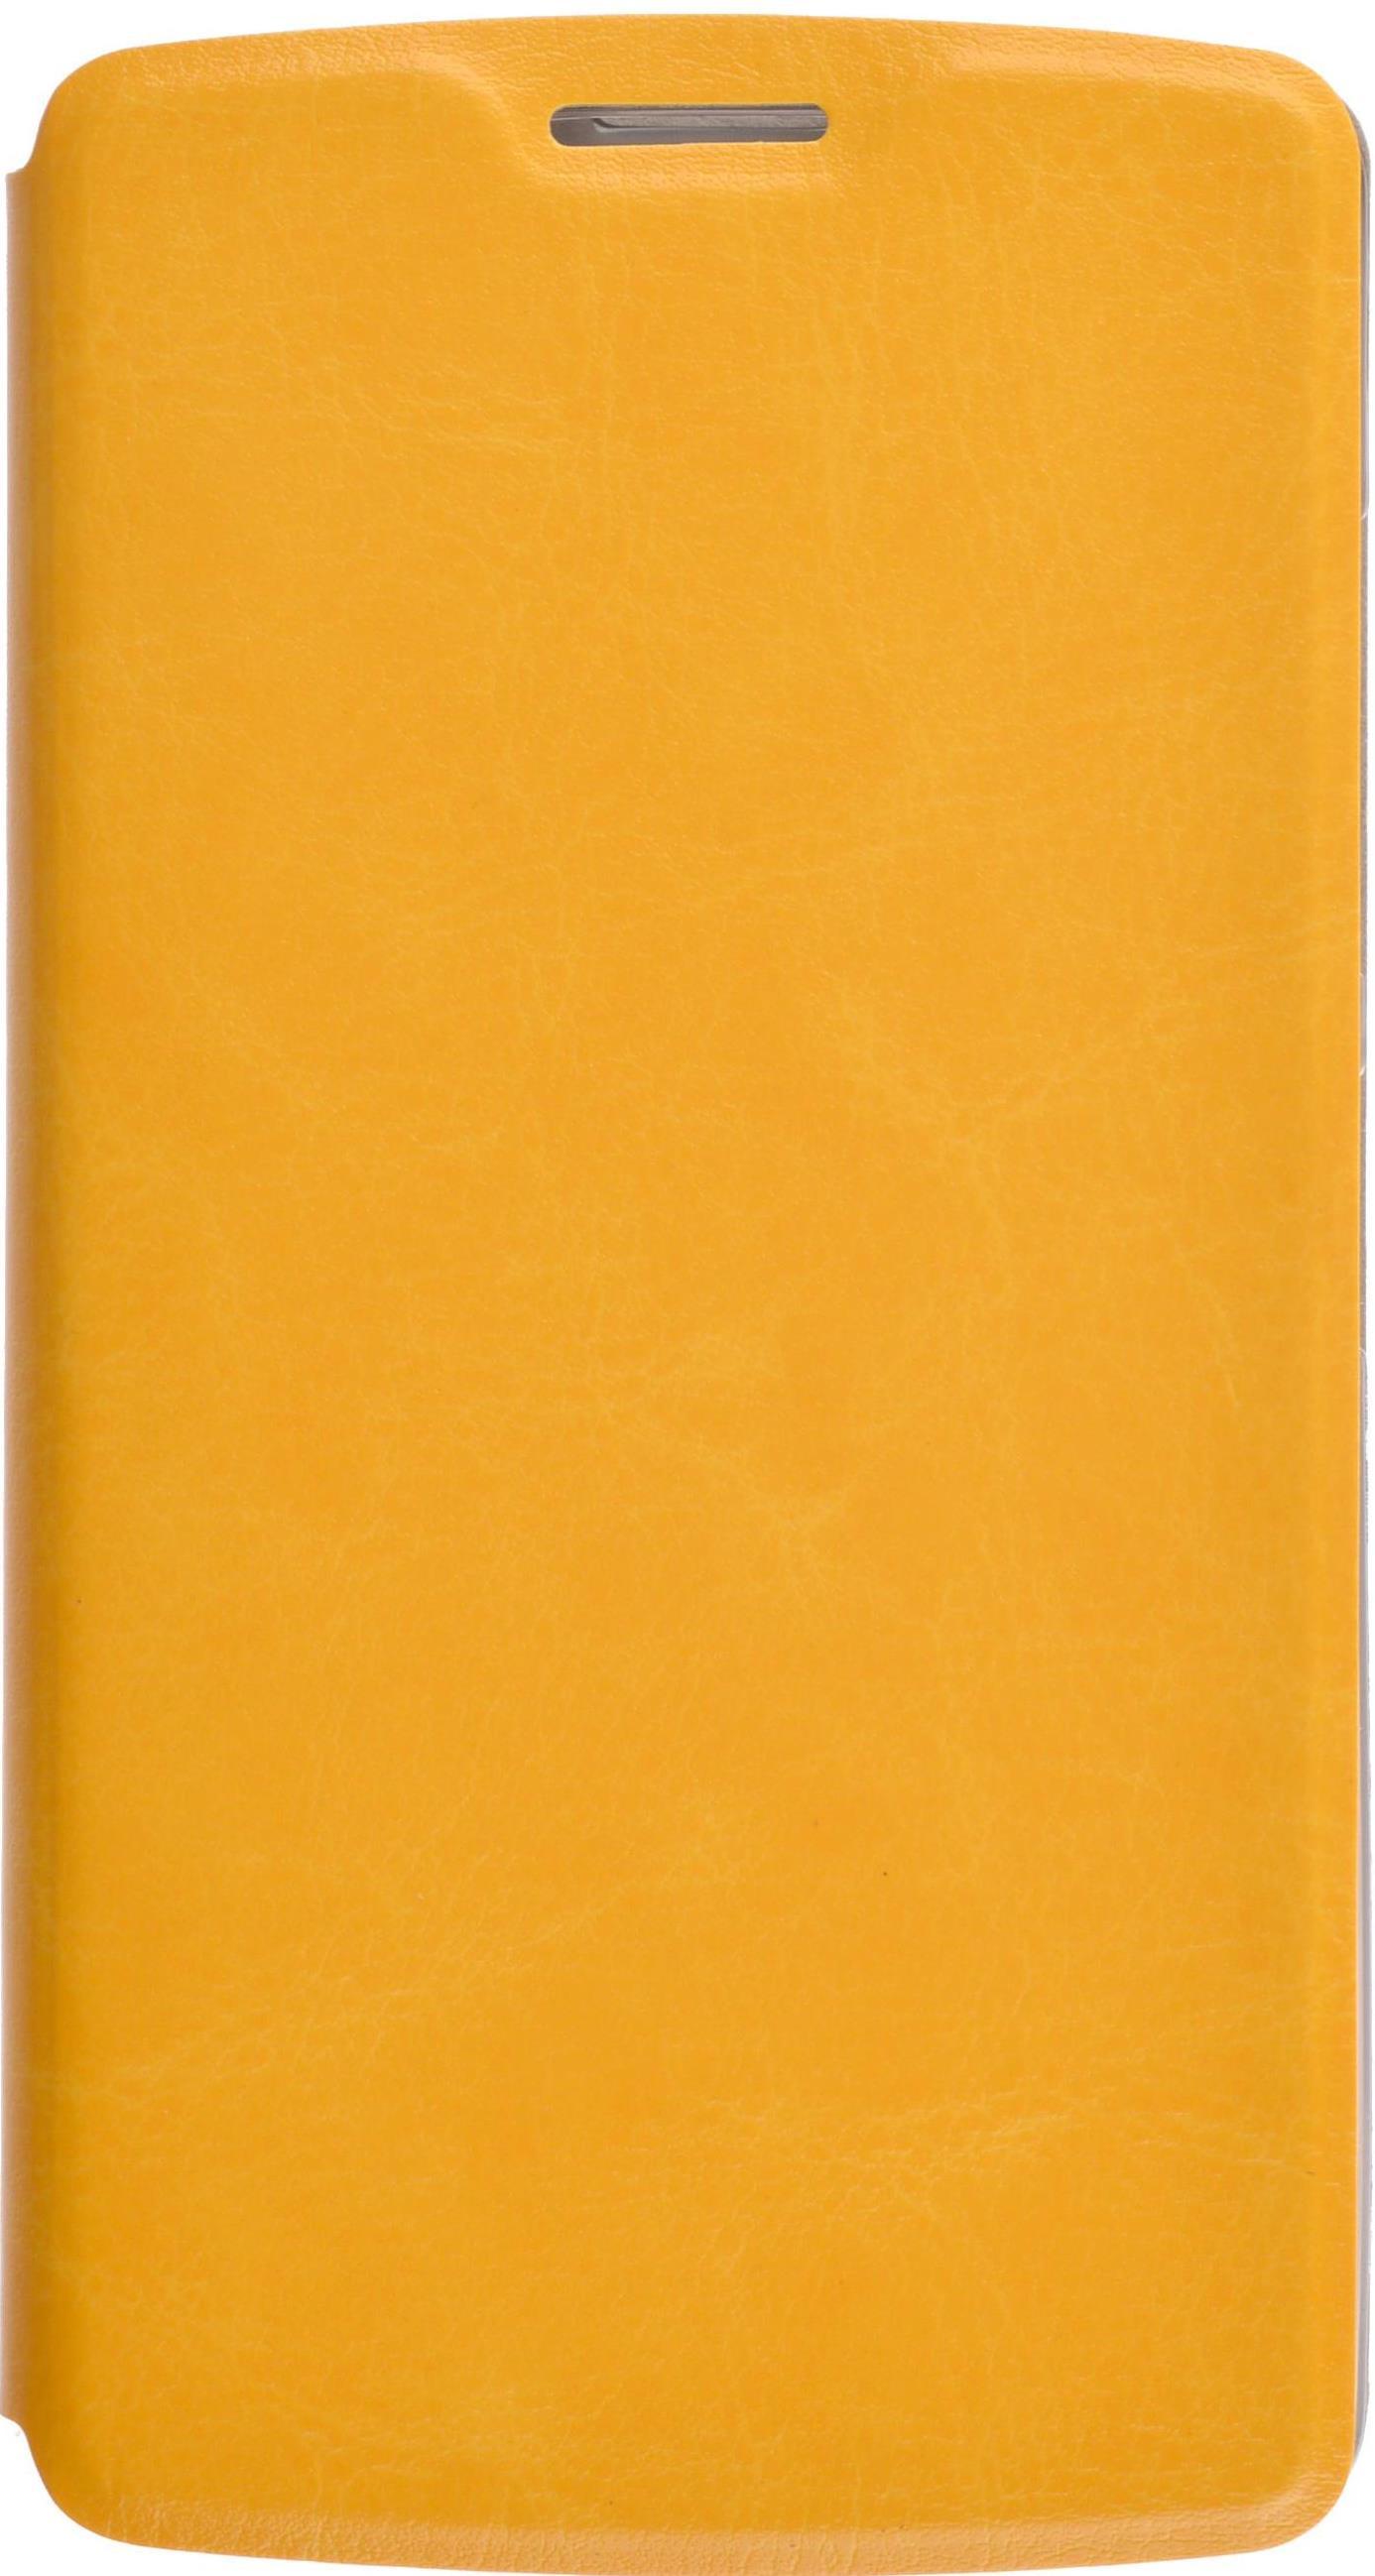 Чехол Skinbox Lux для Lenovo A2010, 2000000082899, желтый